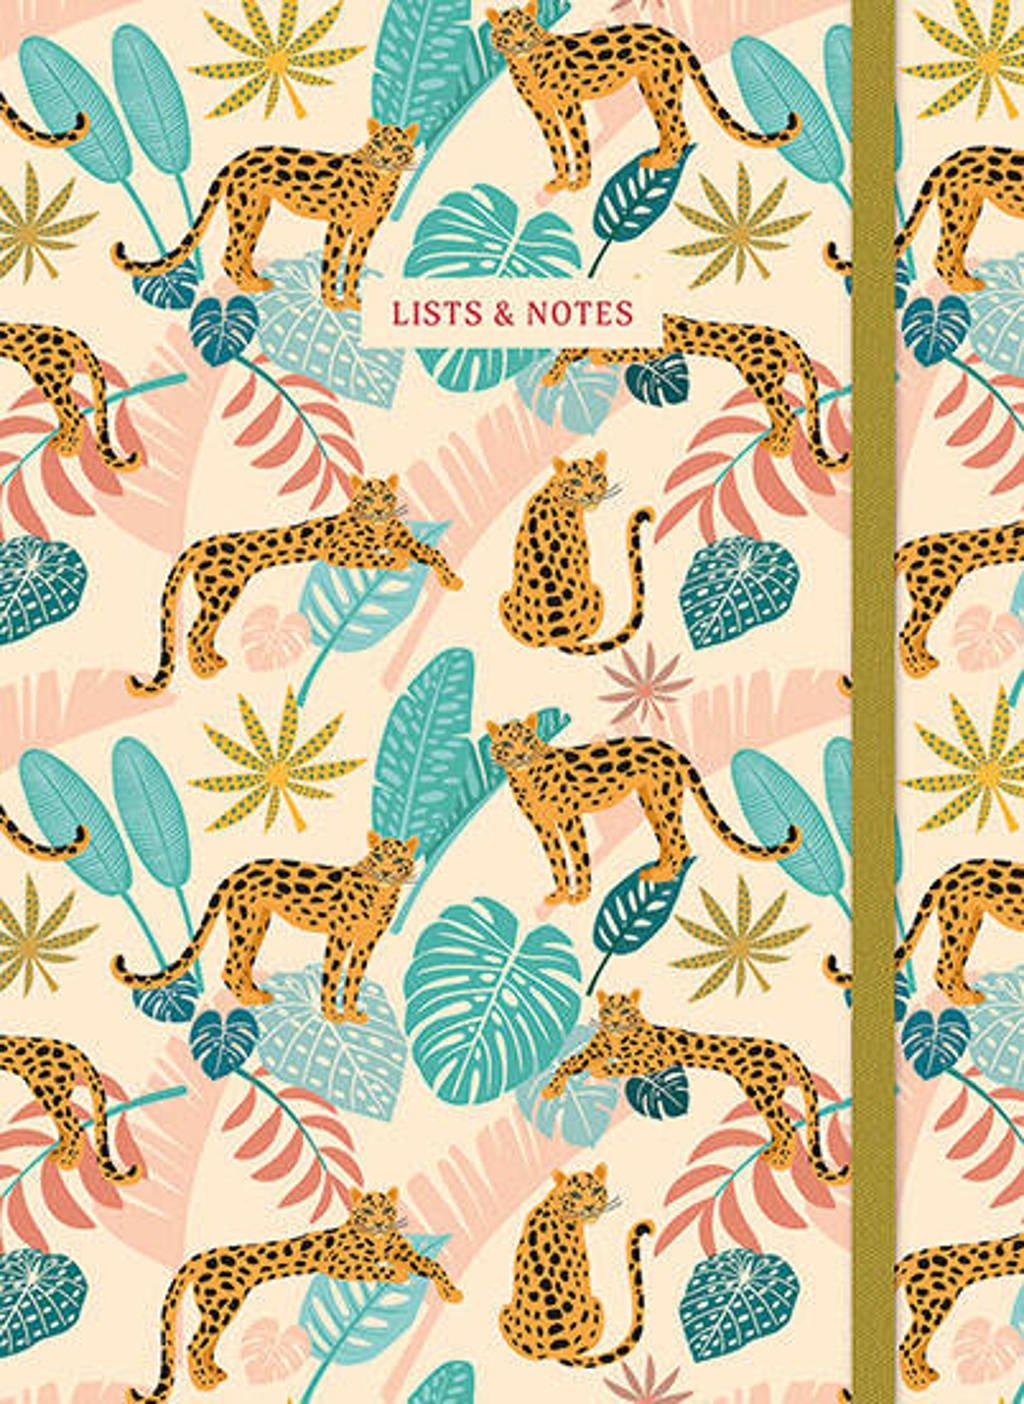 Lists & notes - safari - ZNU